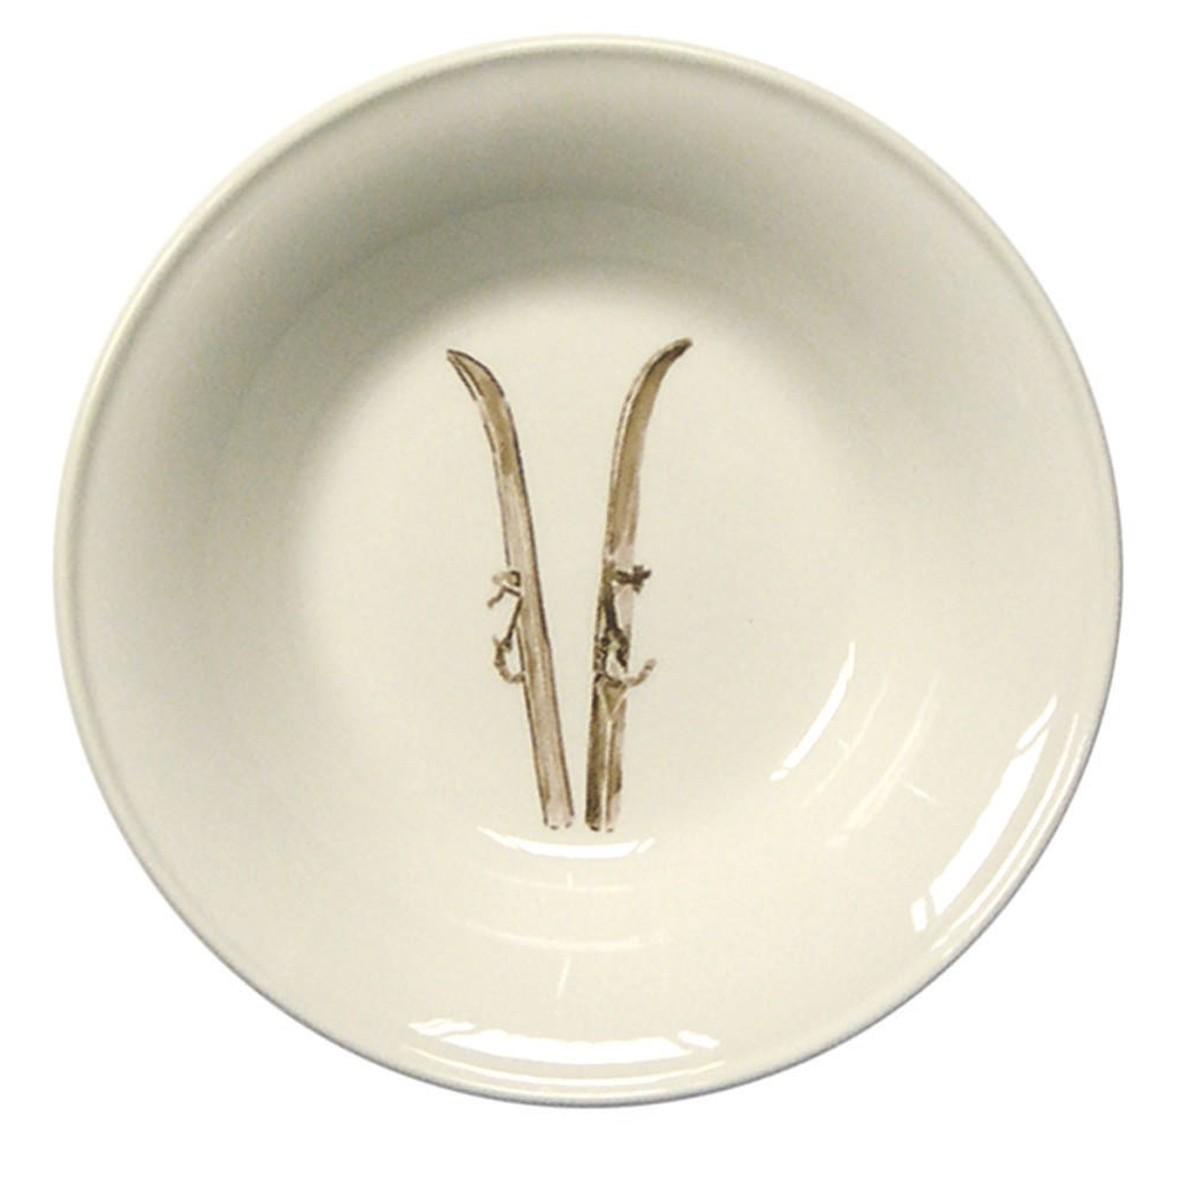 "Chehoma Ascentielle Dinnerware Bowl Large Ski-8""w x 1.68""h"